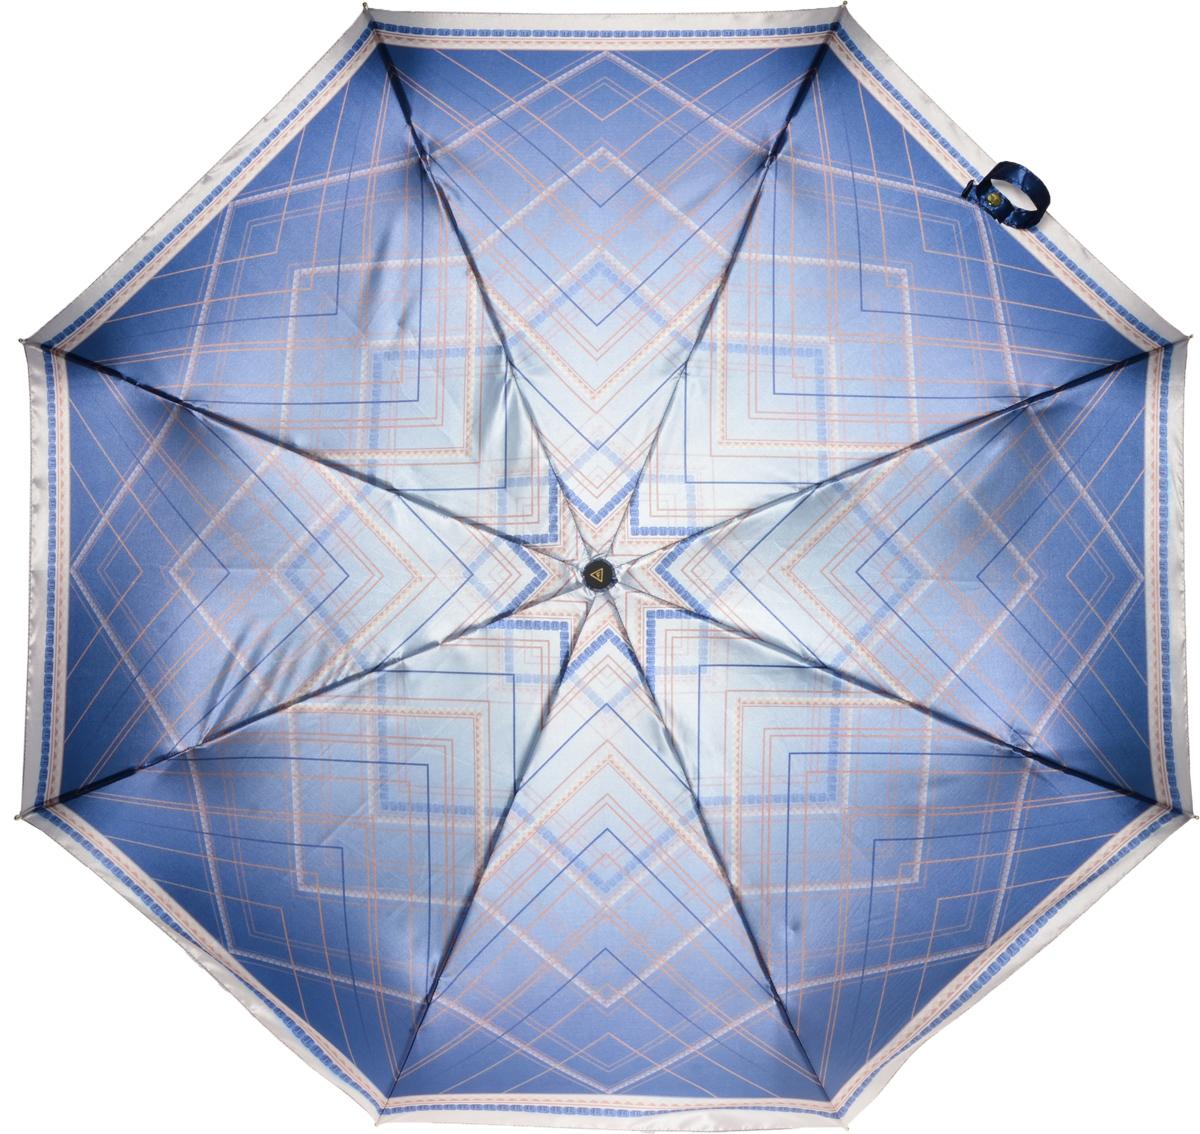 Зонт женский Fabretti, автомат, 3 сложения, цвет: серый. L-16107-10L-16107-10Зонт женский Fabretti, облегченный суперавтомат, 3 сложения